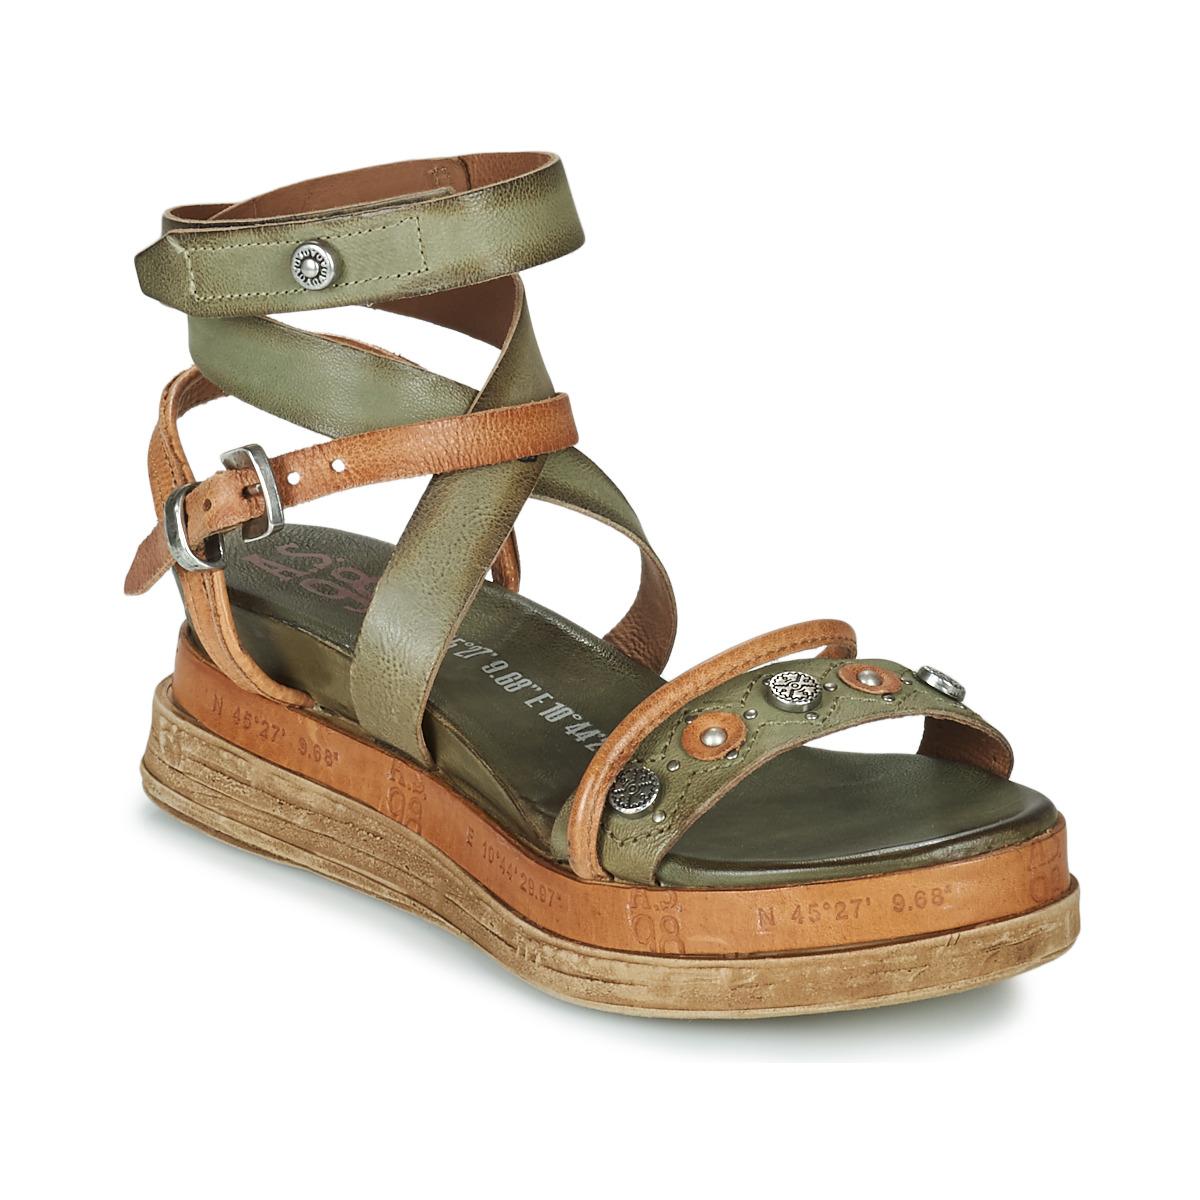 airstep / a.s.98  lagos  women's sandals in kaki